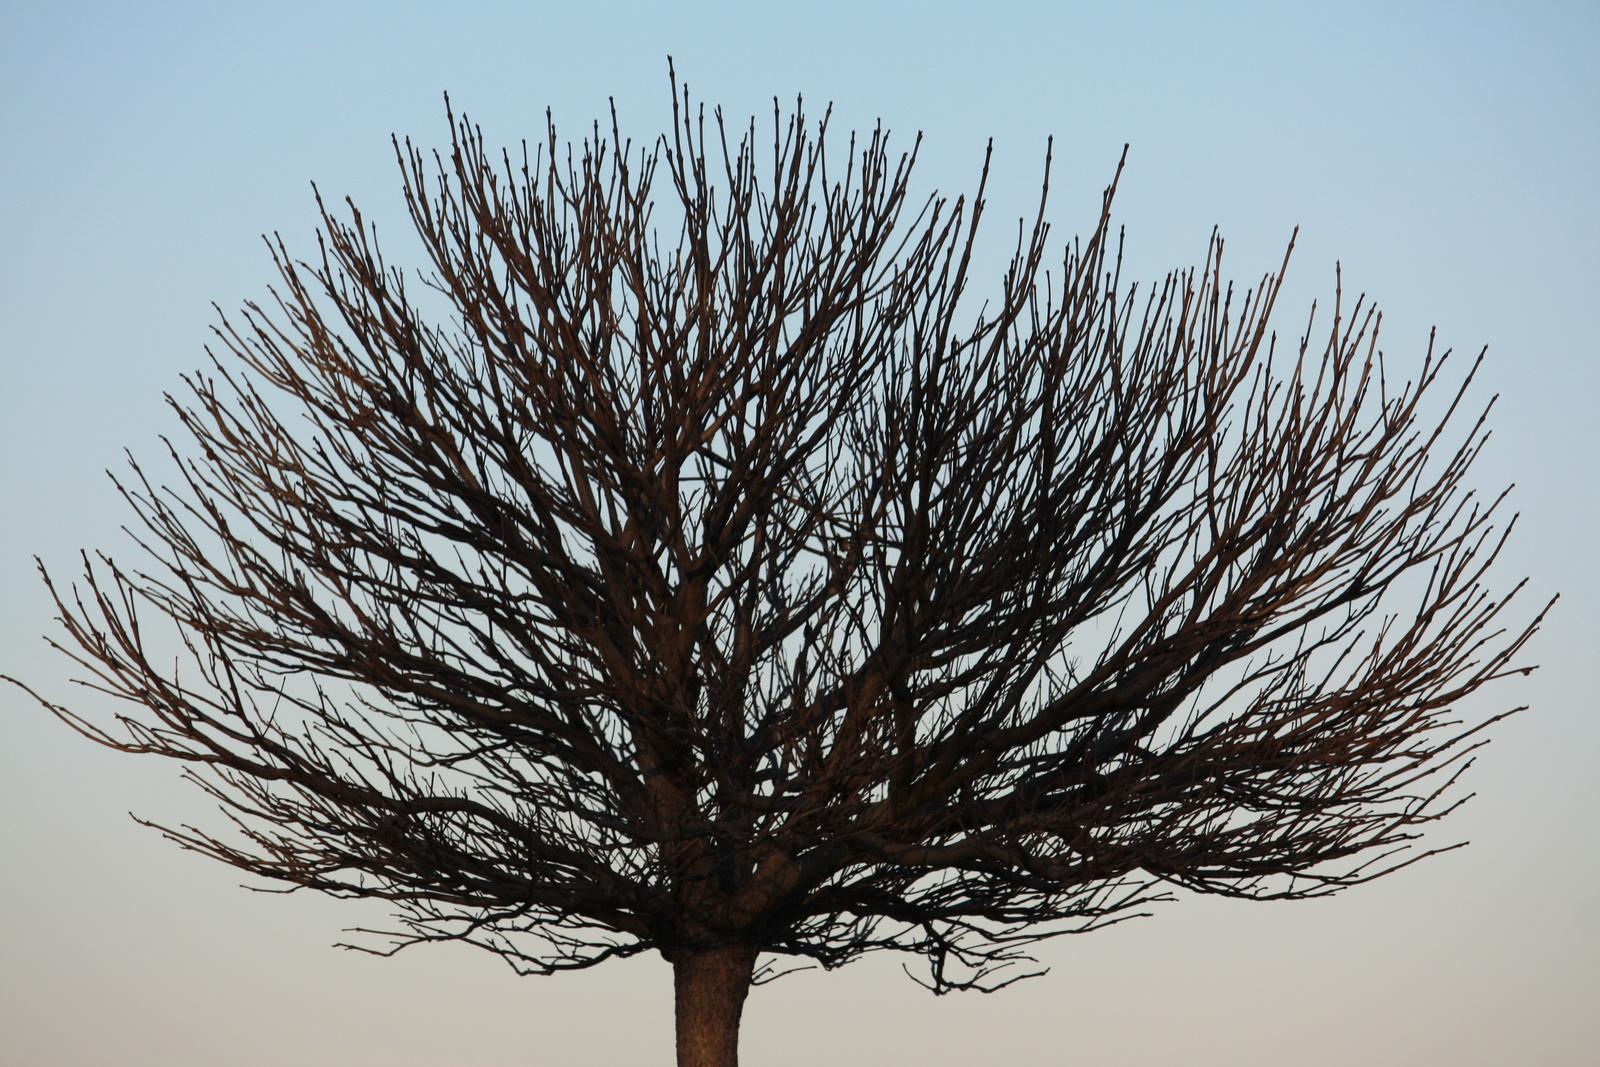 IMG_0036 γυμνό δένδρο_resize